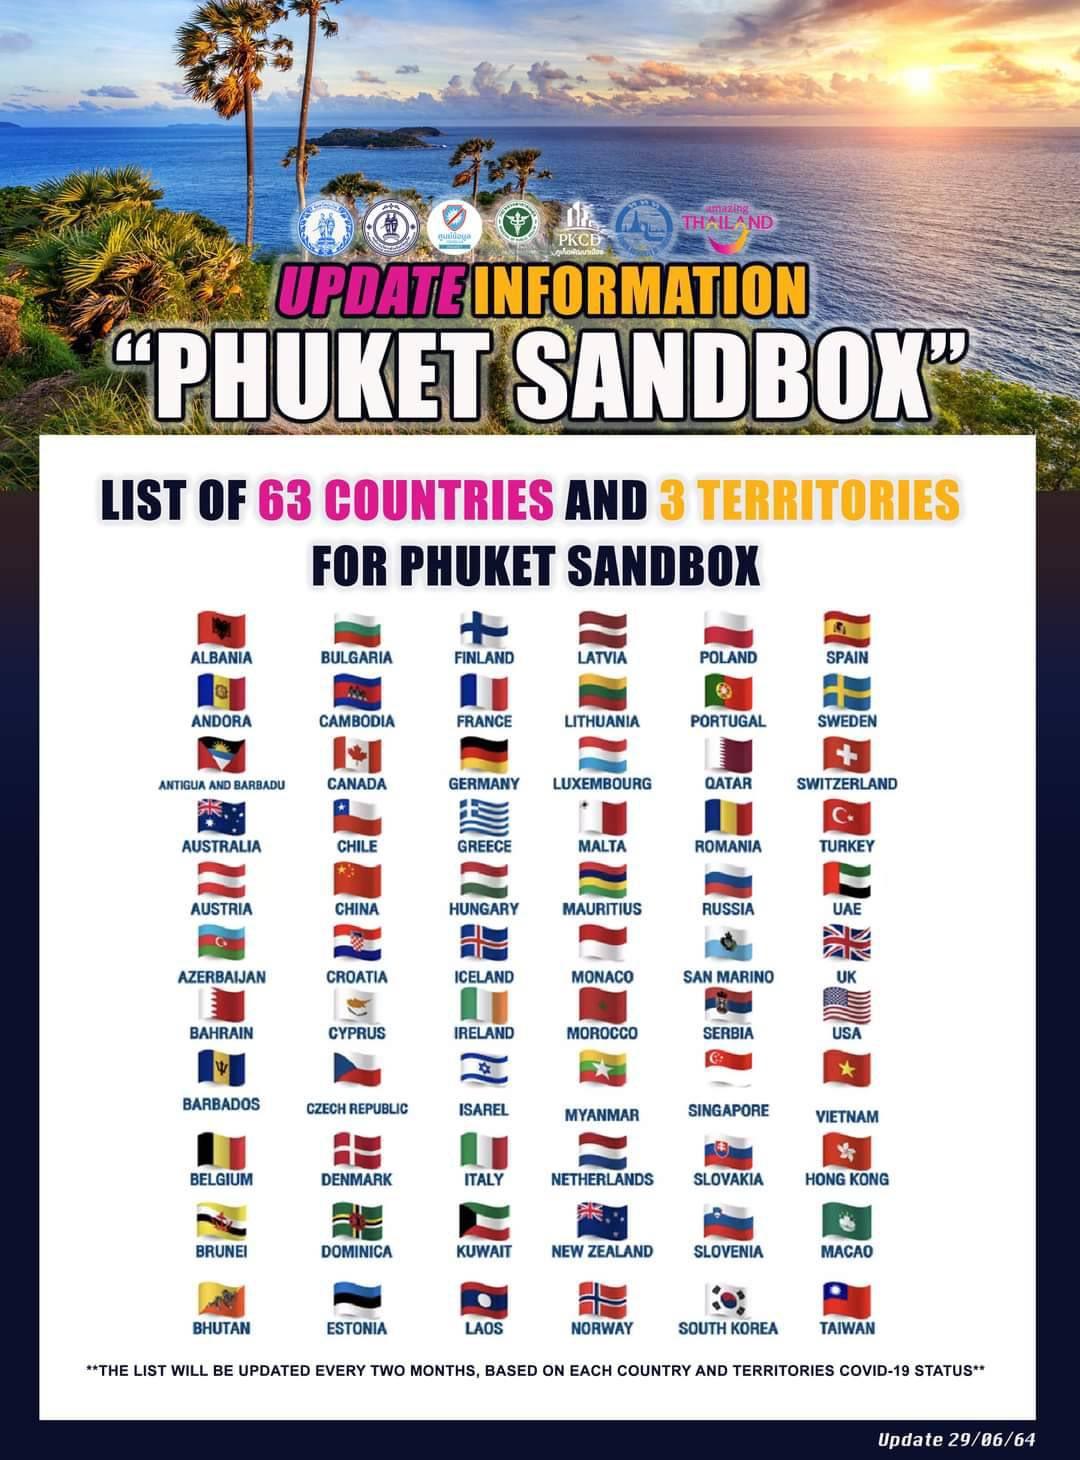 phuket-sandbox-information-top-25-restaurants - top 25 restaurants phuket